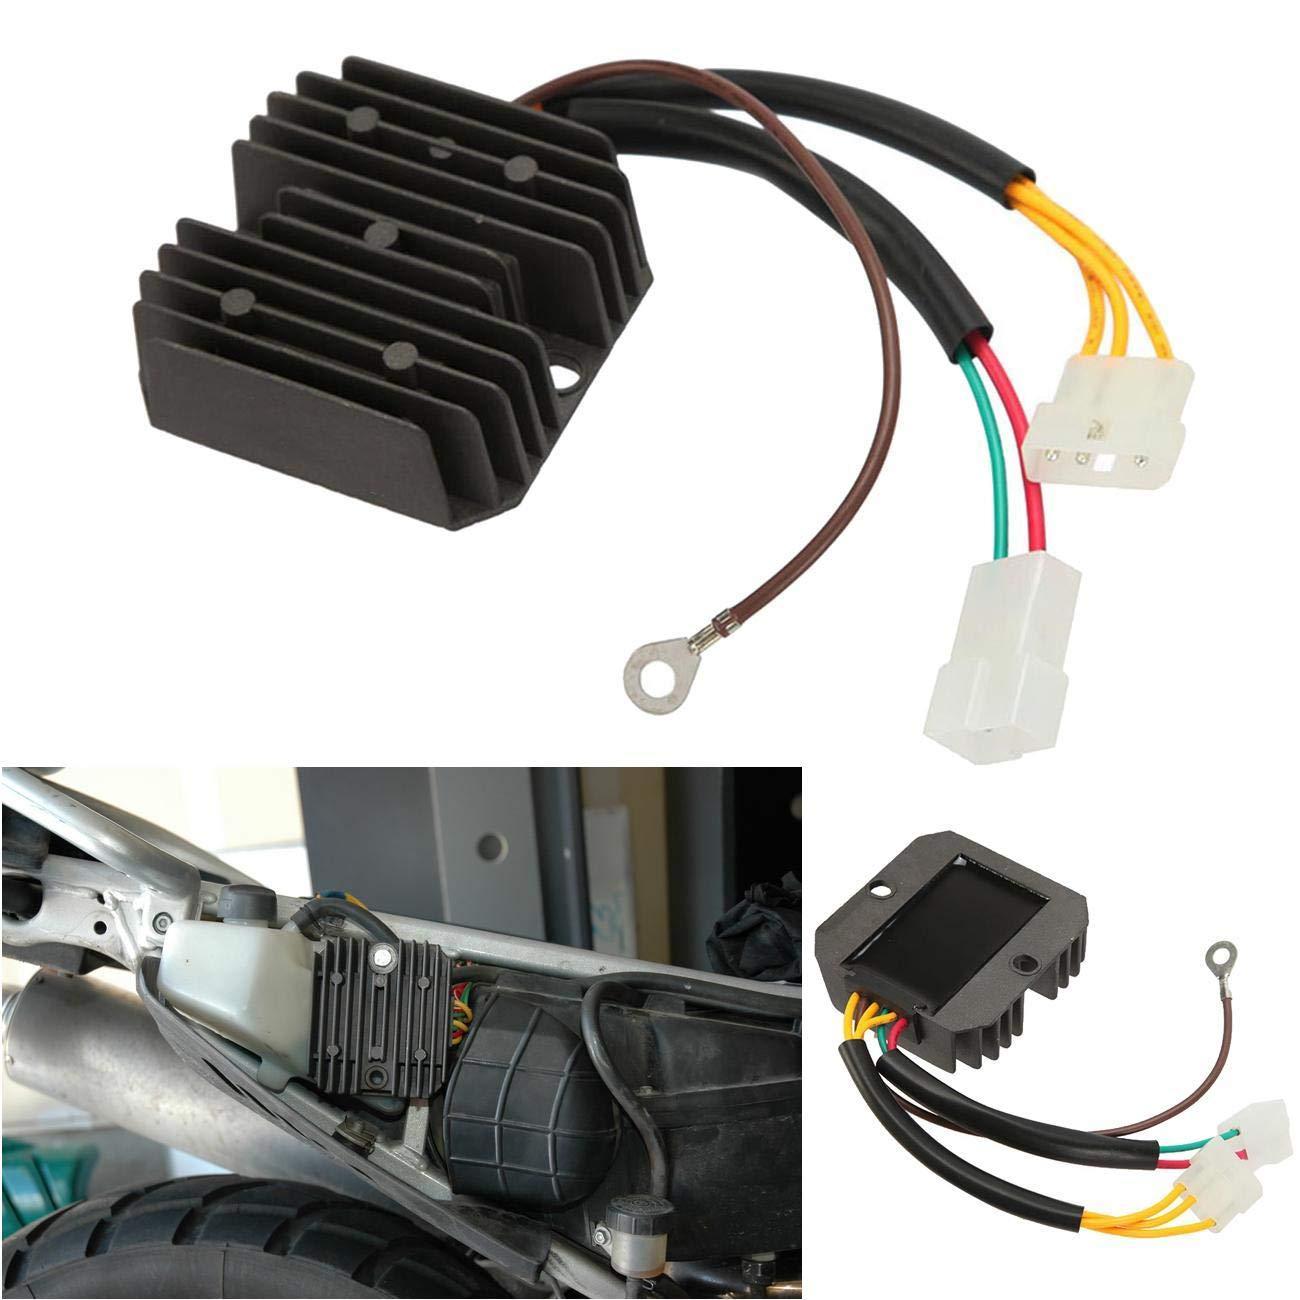 INNOGLOW Motorcycle Rectifier Voltage Regulator Fits for BMW F650 1997-2001 F650GS 1999-2011 G650 Xchallenge 2007-2010